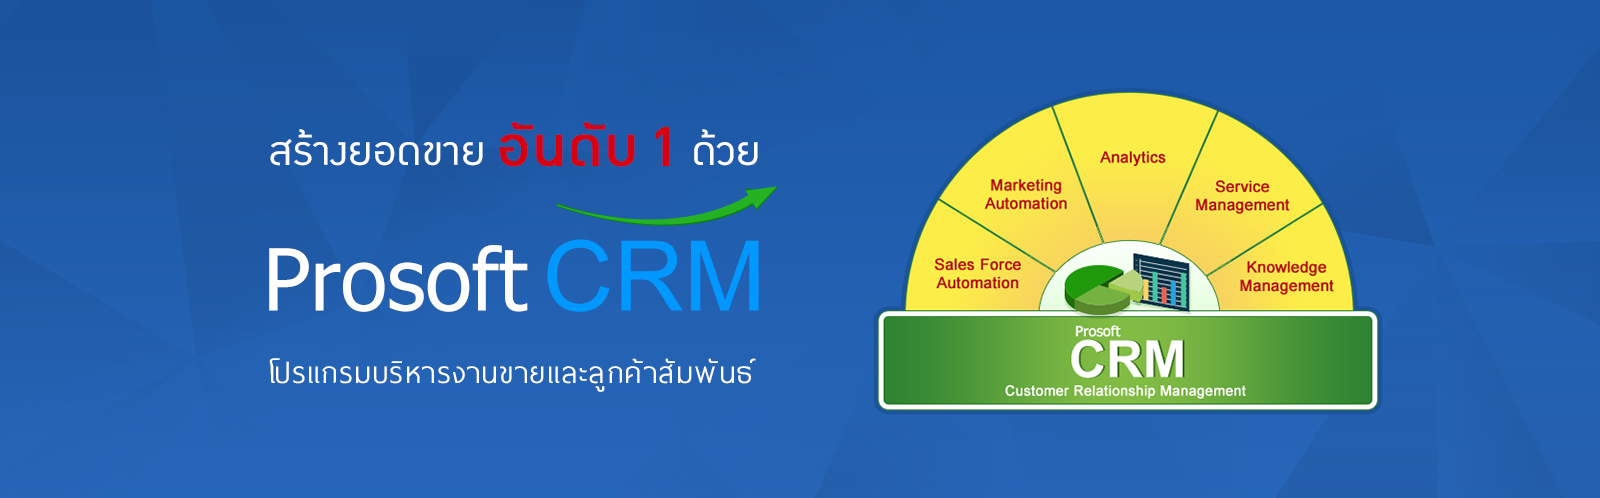 Prosoft CRM